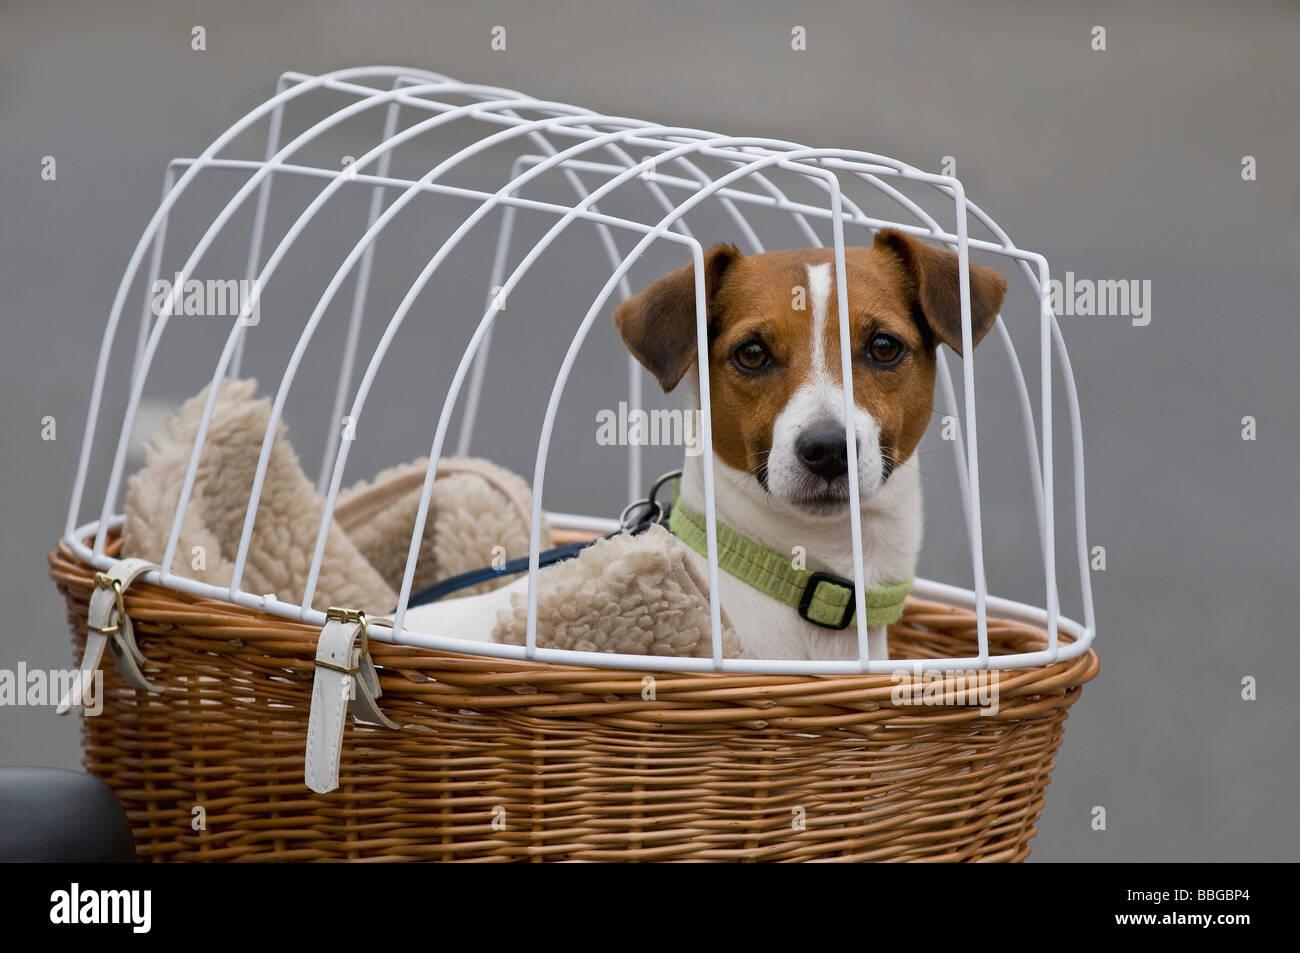 Jack Russell Terrier im Fahrradkorb mit Gitter Deckel Blick auf den Betrachter Stockbild